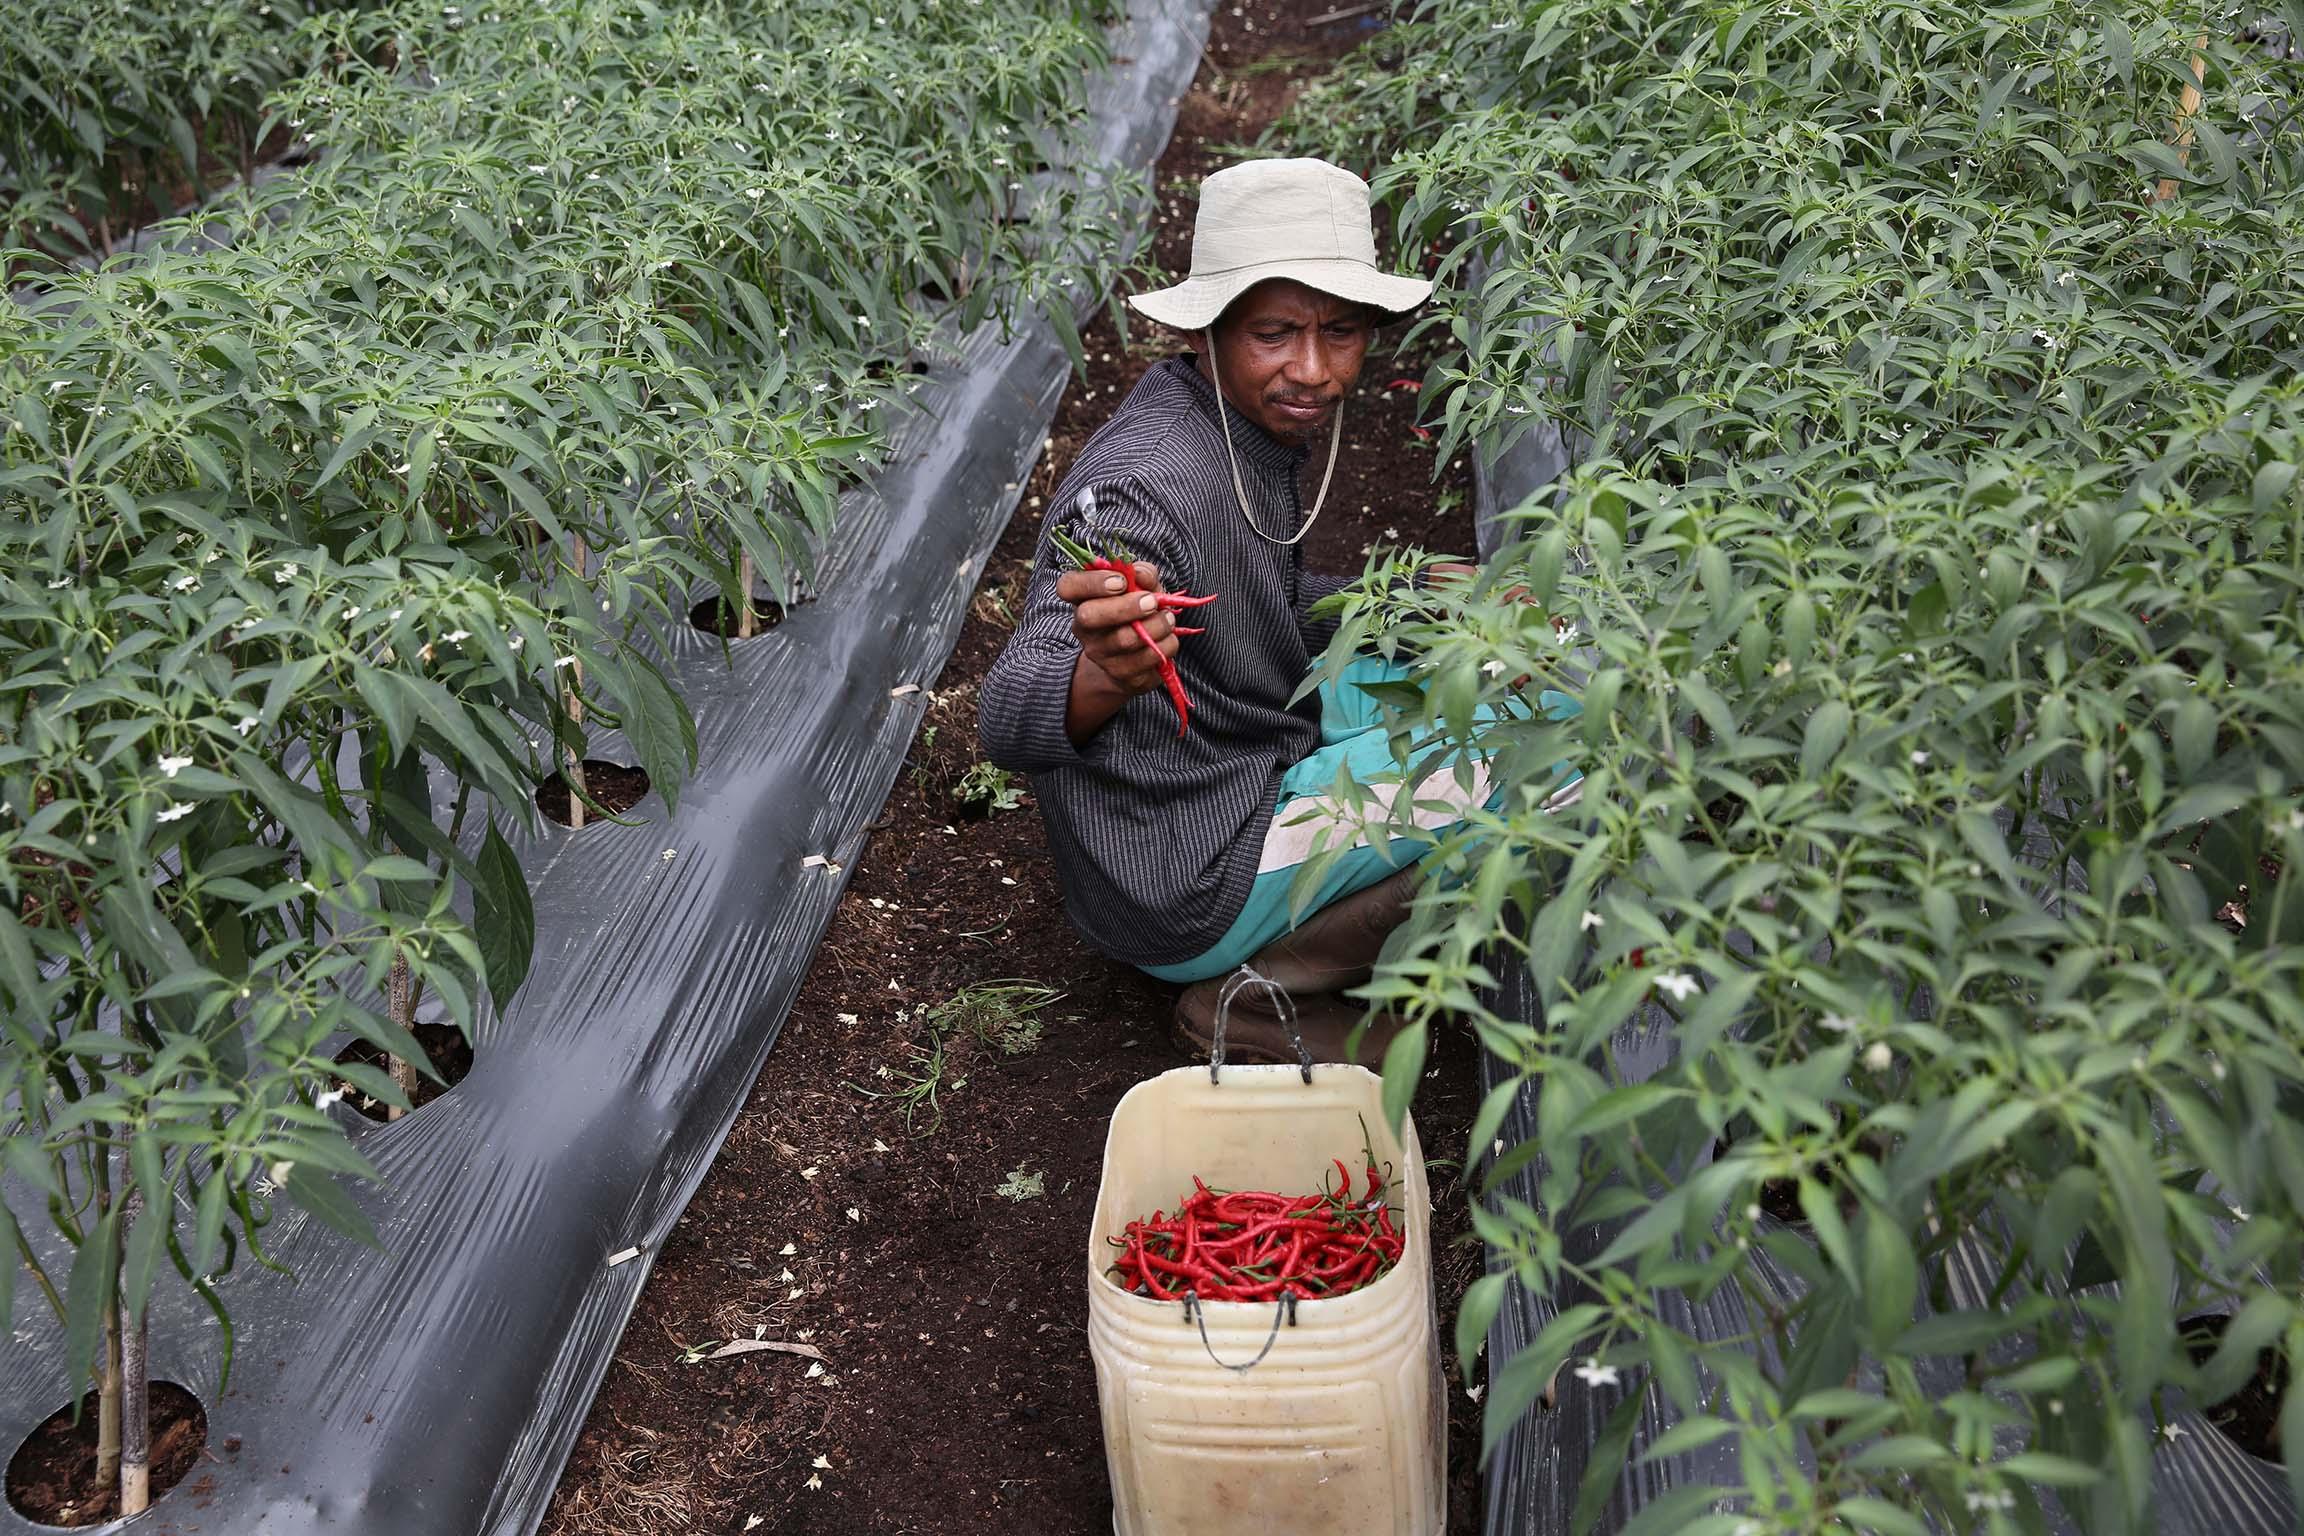 RER acok chilli farmer conservation